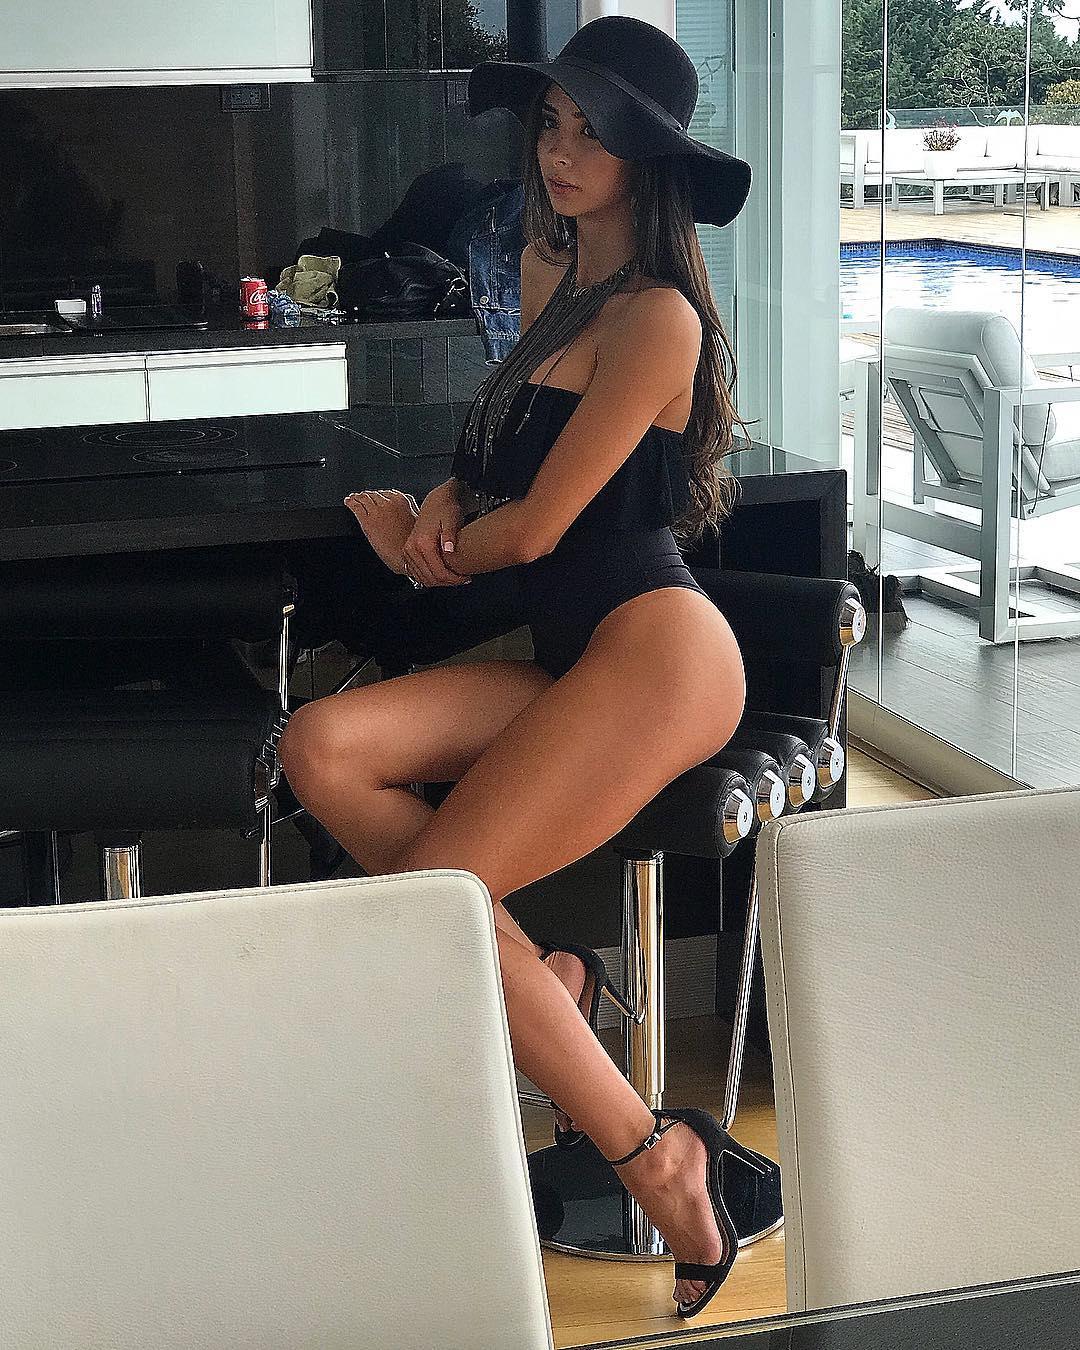 laura osorio hoyos, miss colombia mundo 2018. - Página 2 26864311